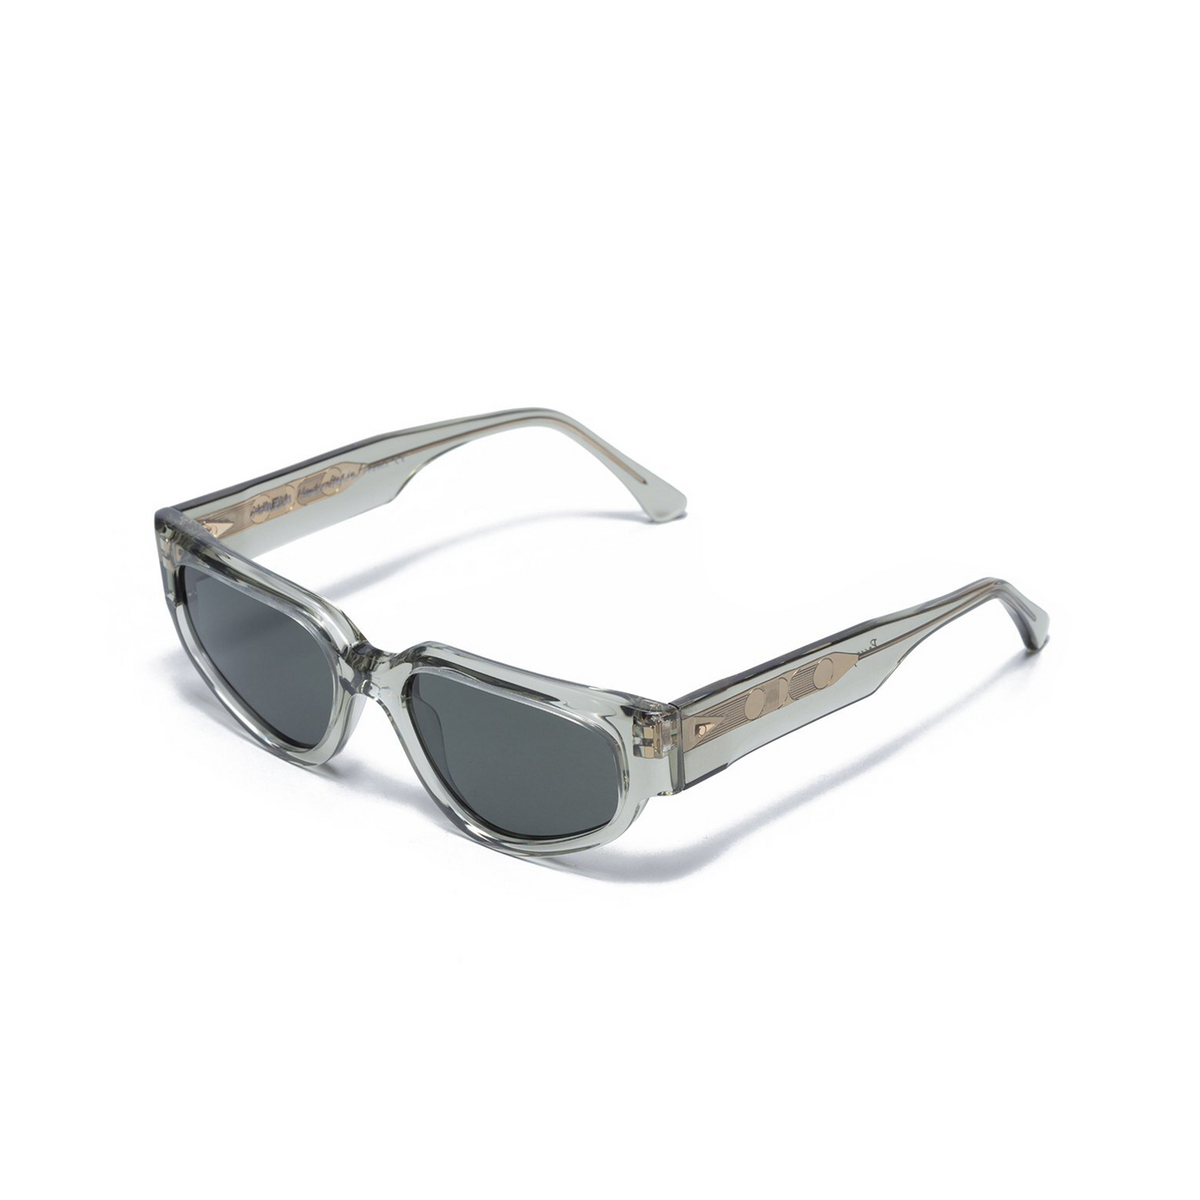 Ahlem® Cat-eye Sunglasses: Passage Lepic color Thymelight.